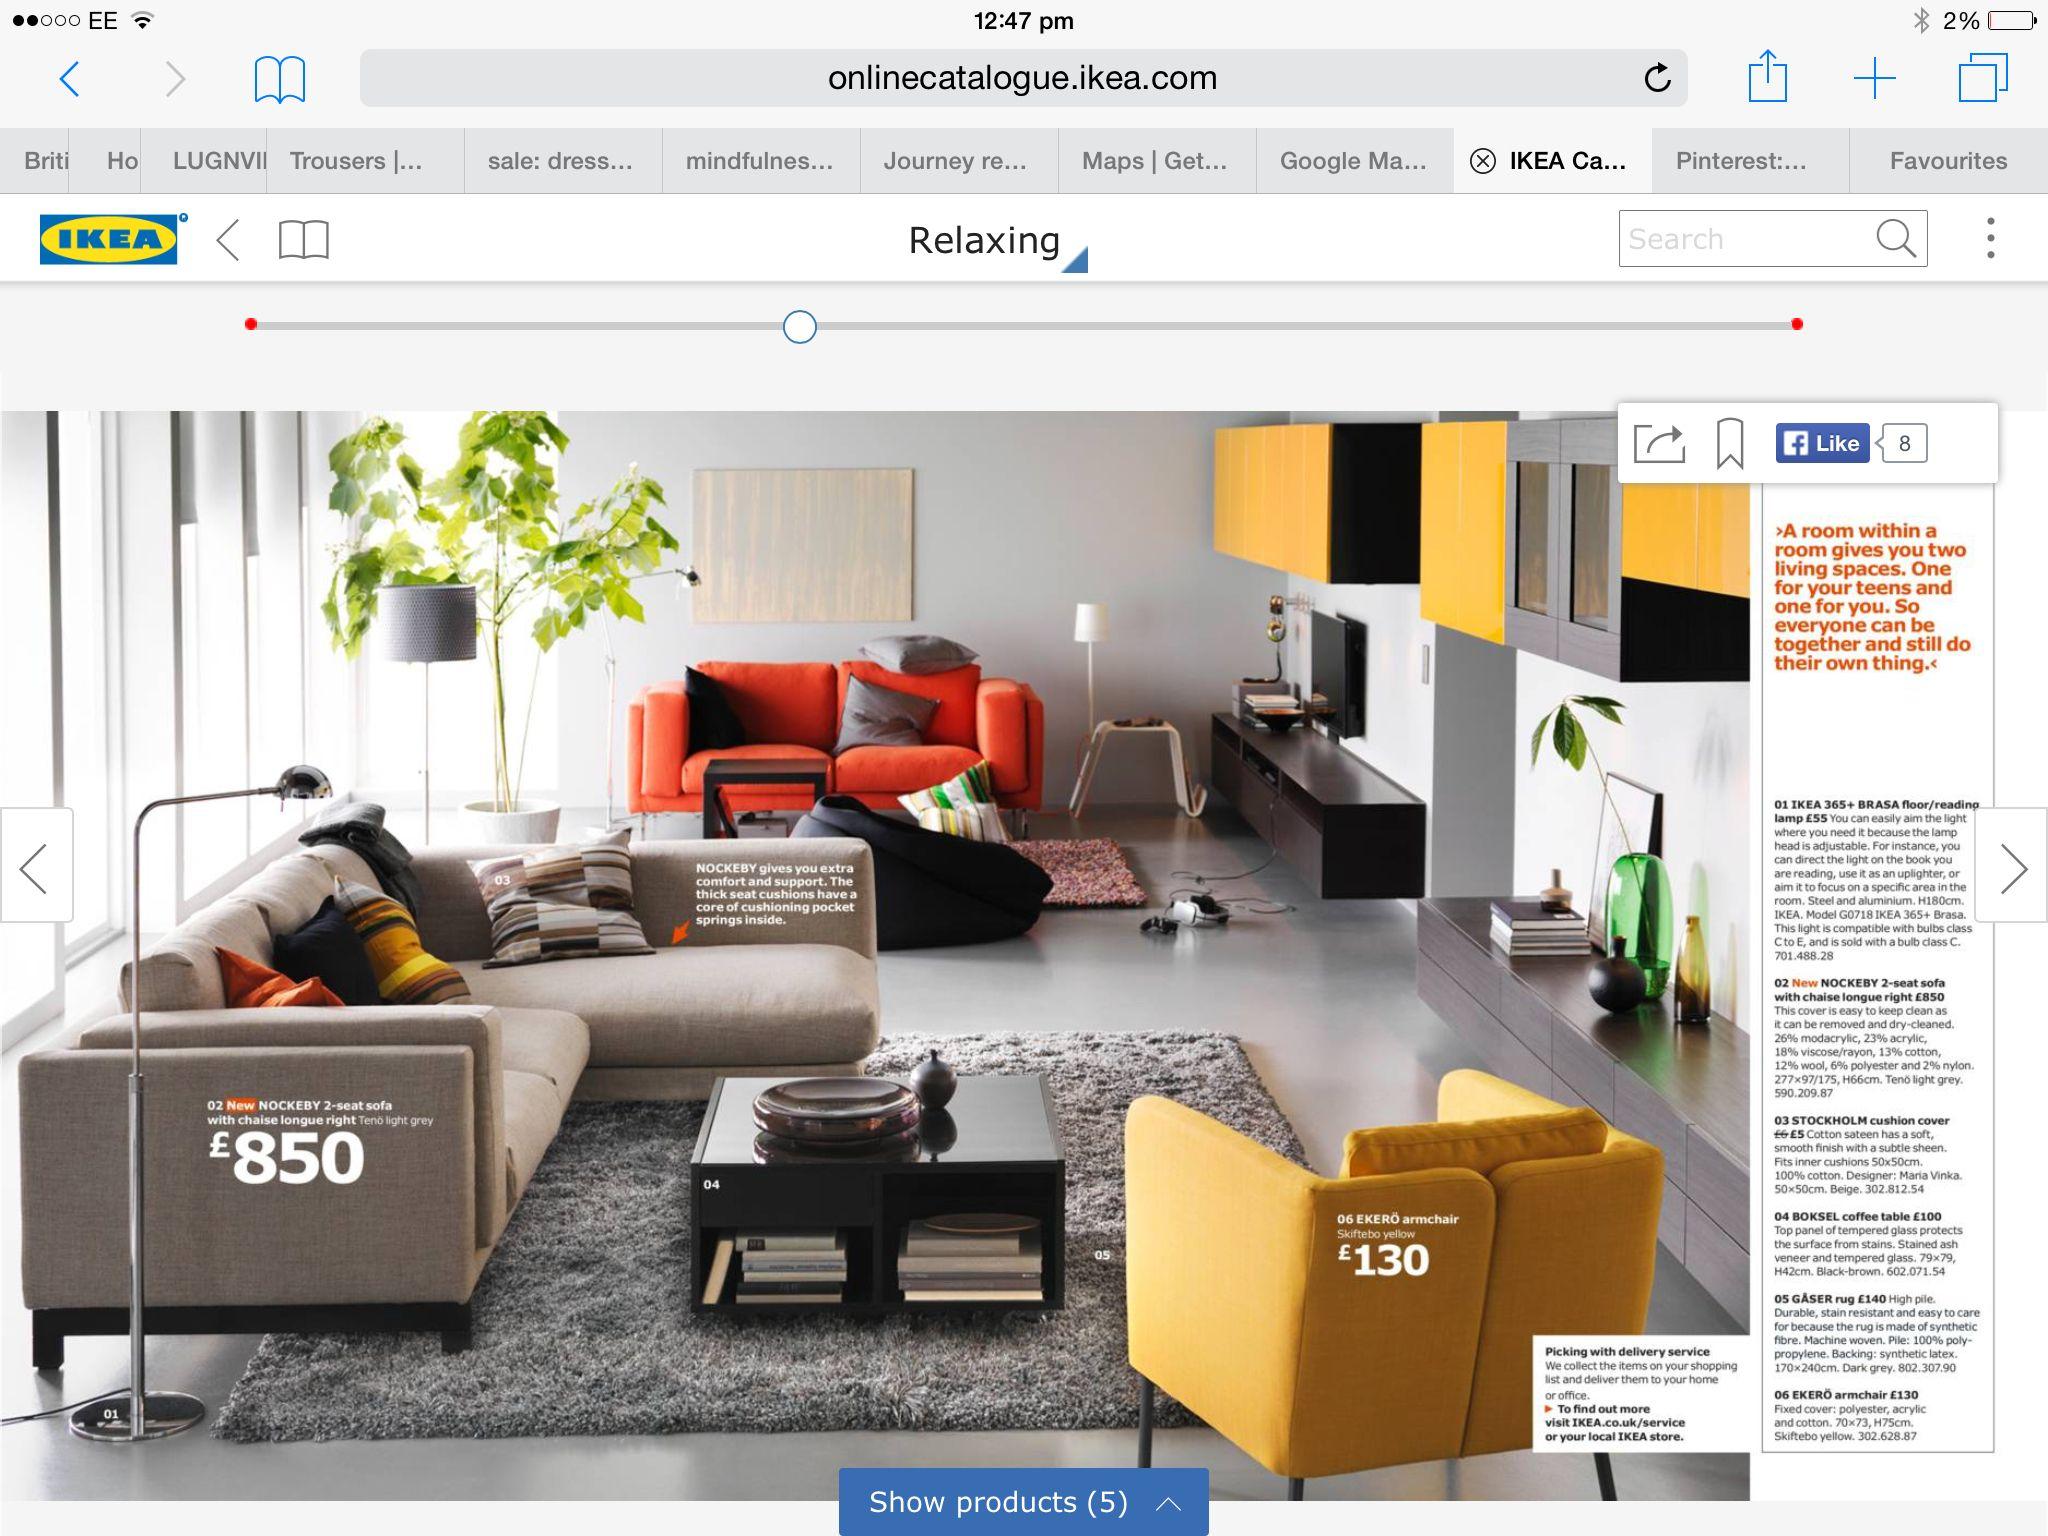 L Shape Sofa For New Lounge Http Onlinecatalogue Ikea Com Gb En Ikea Catalogue Ikea Living Room Flat Decor Furniture [ 1536 x 2048 Pixel ]